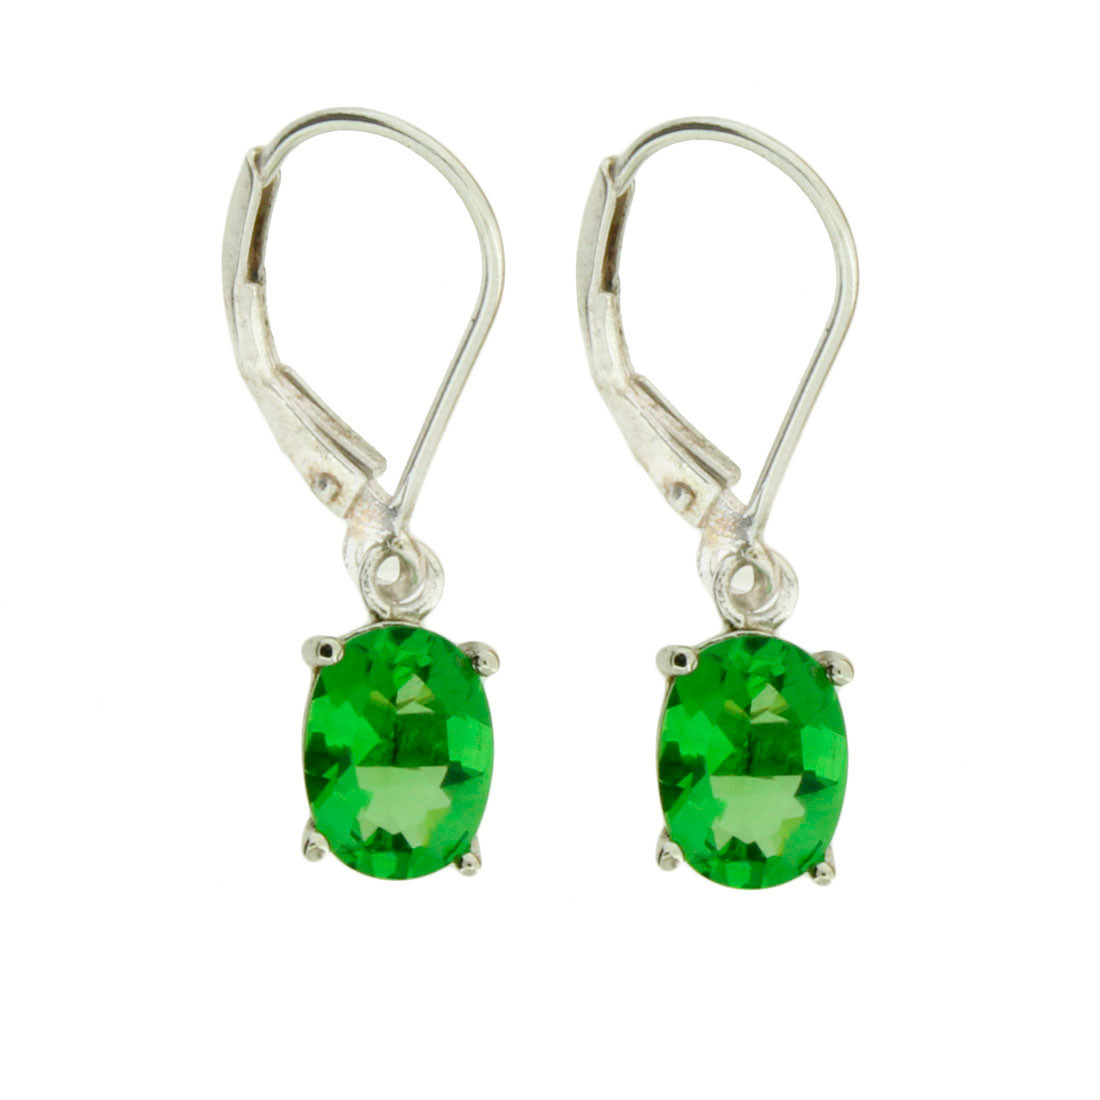 Green Helenite Sterling Silver Earrings